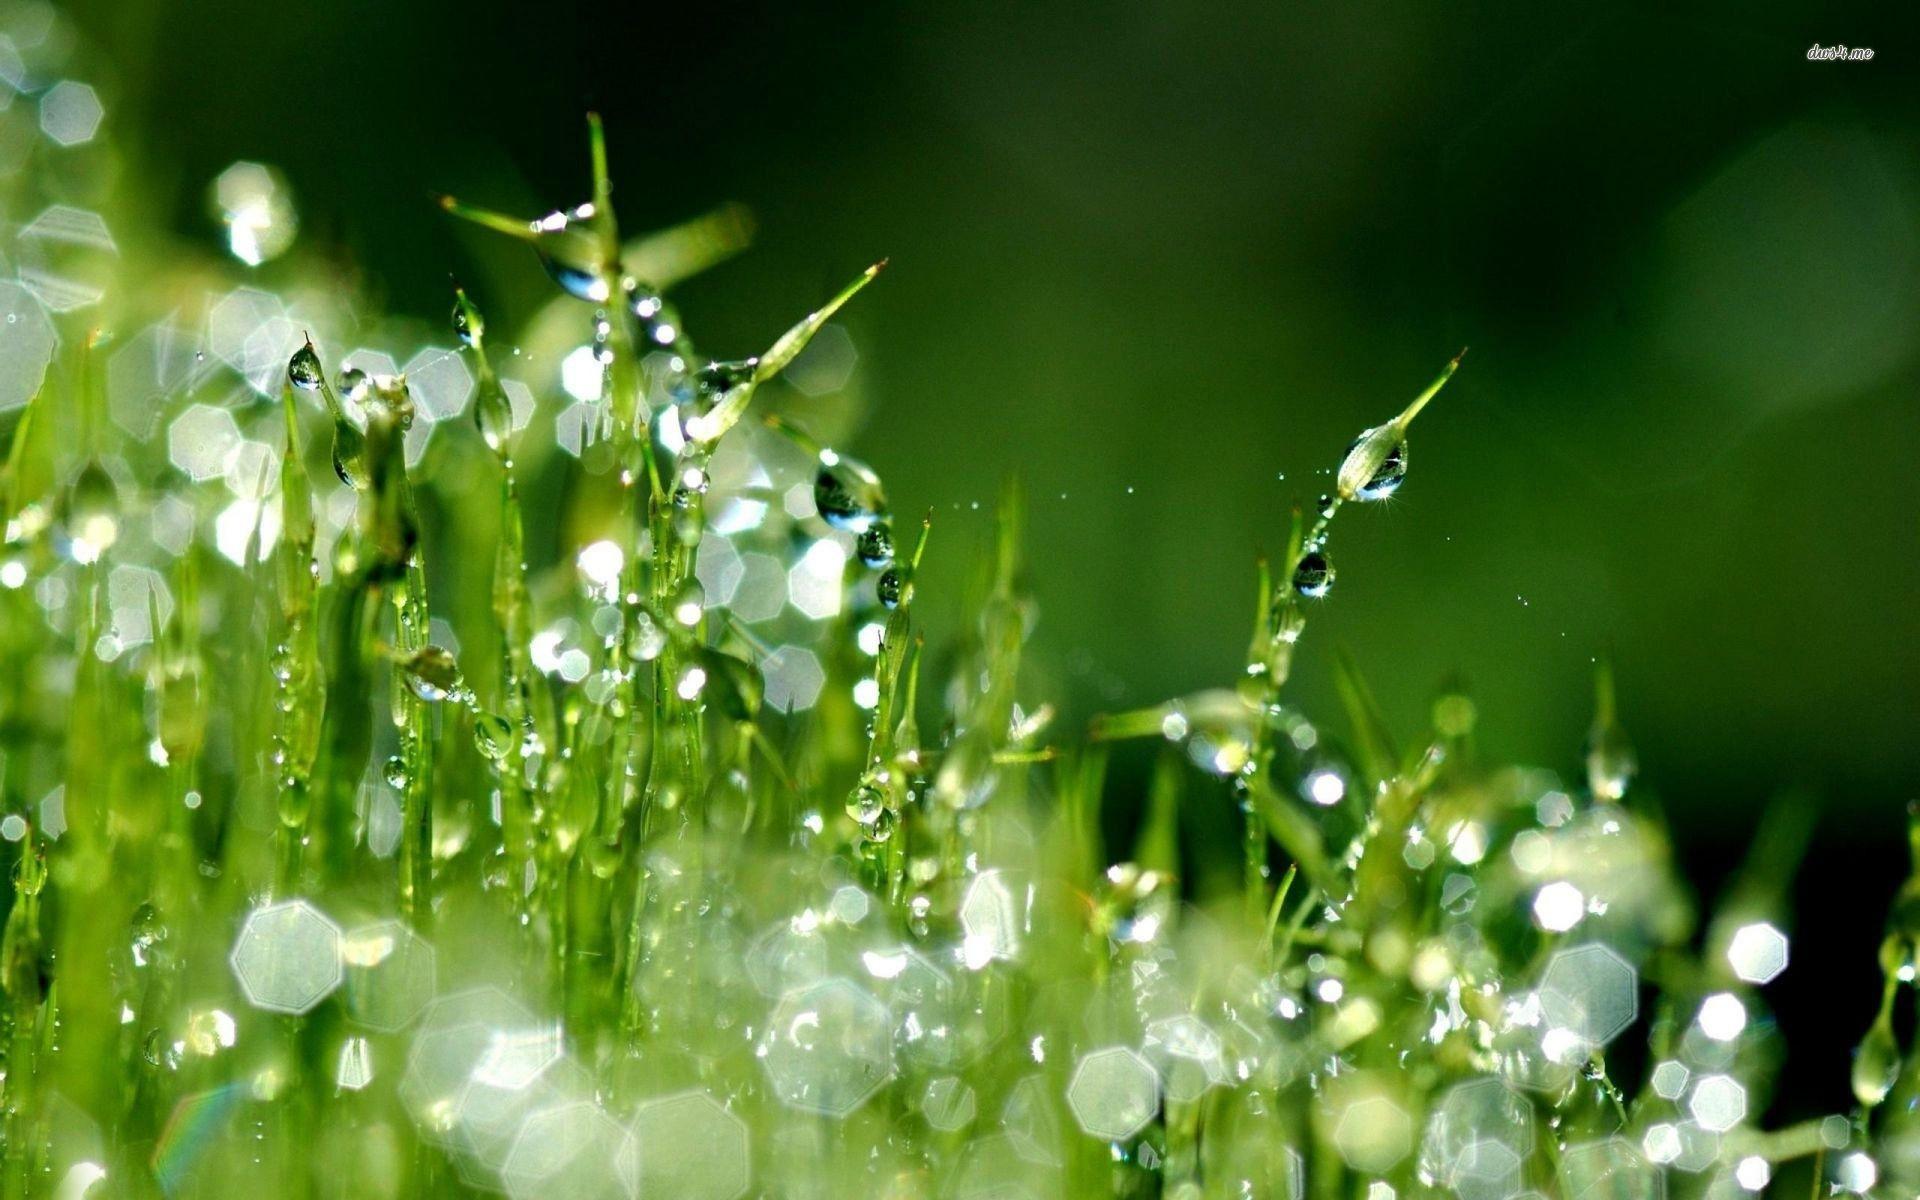 Res: 1920x1200, Raindrops on grass wallpaper